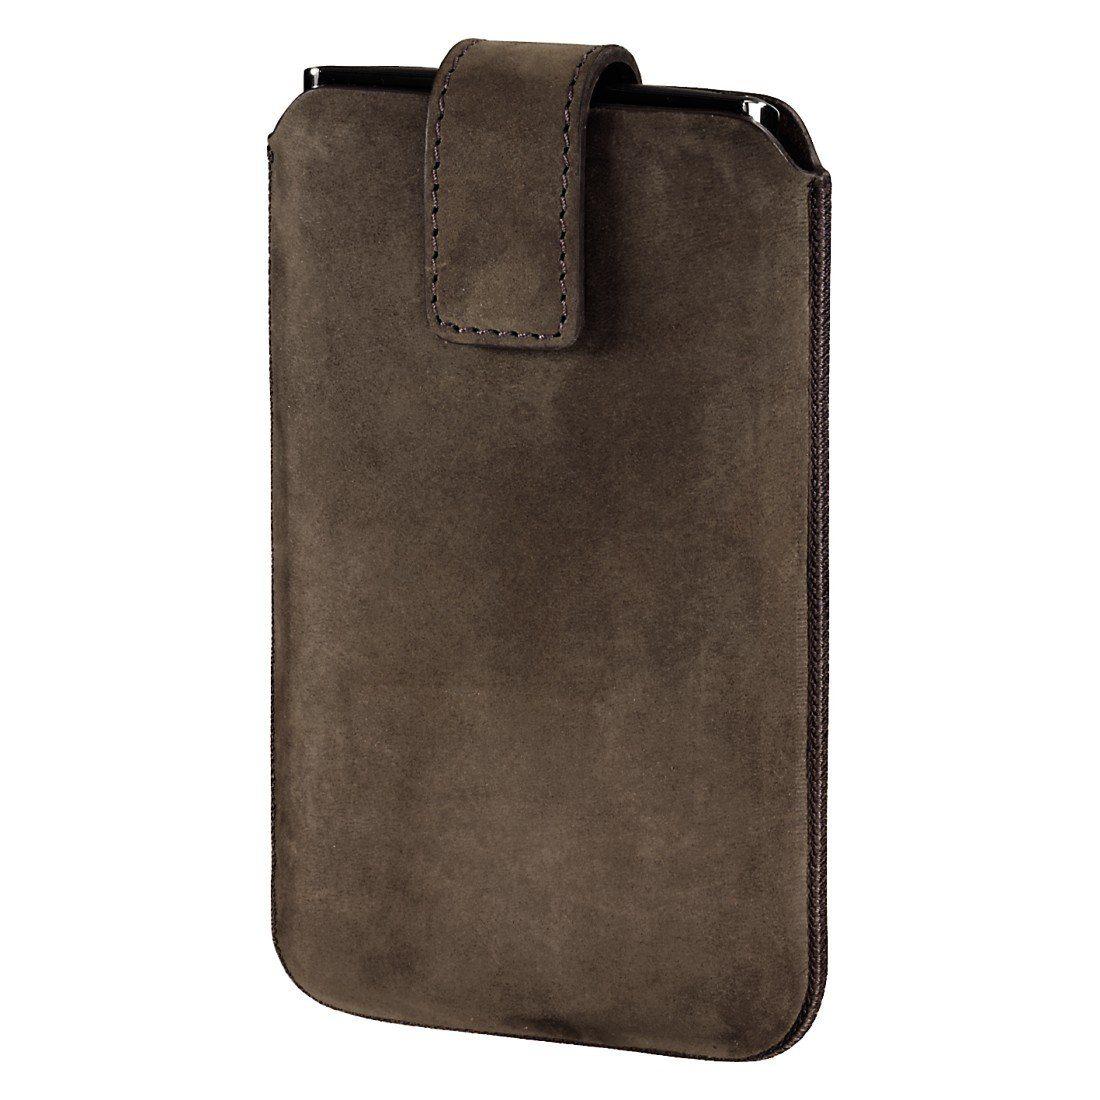 Hama Smartphone-Sleeve Chic Case, Gr. L, Braun